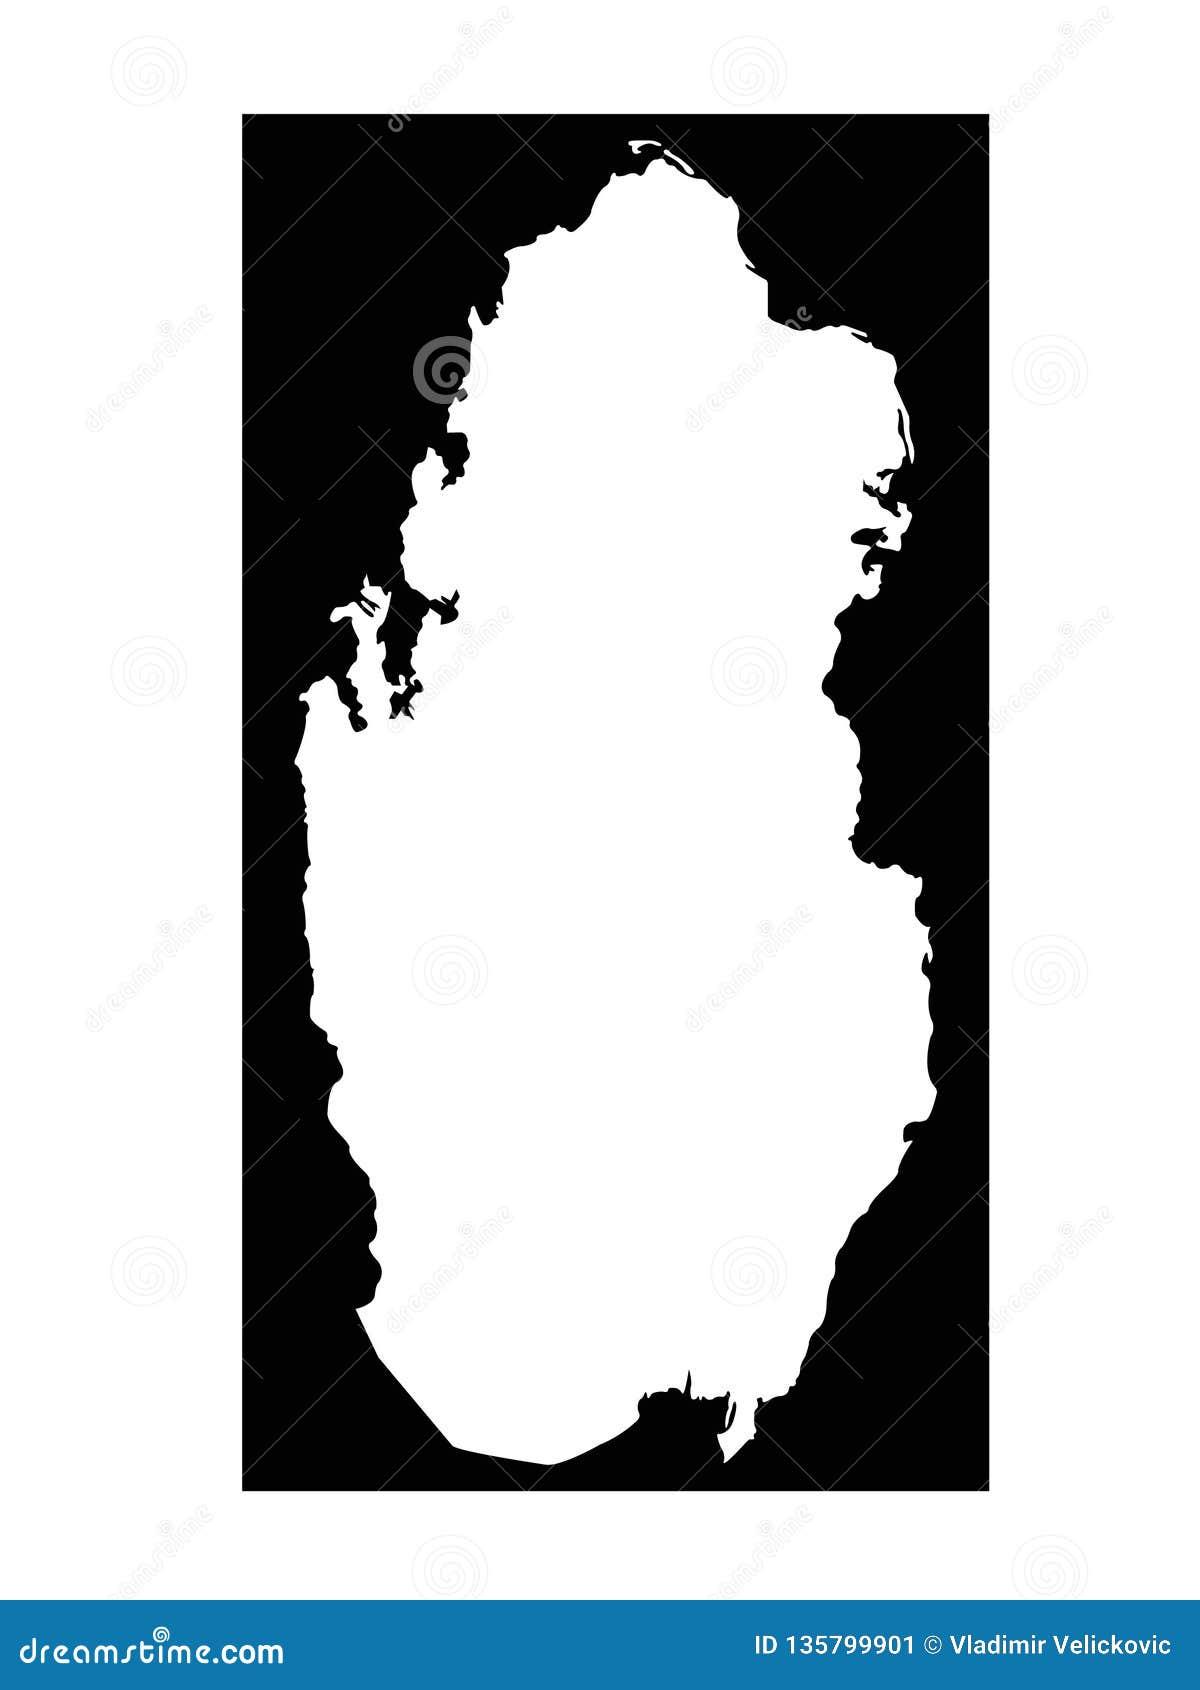 Qatar map - State of Qatar stock vector. Illustration of ...